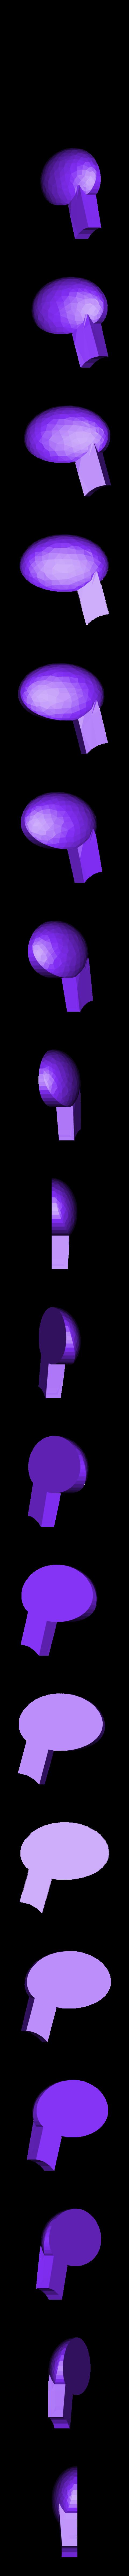 Snoopy_vs_Red_Baron-Ear_Cap_R.stl Download free STL file Snoopy vs Red Baron Bank (Compilation/remix) • 3D print template, lowboydrvr